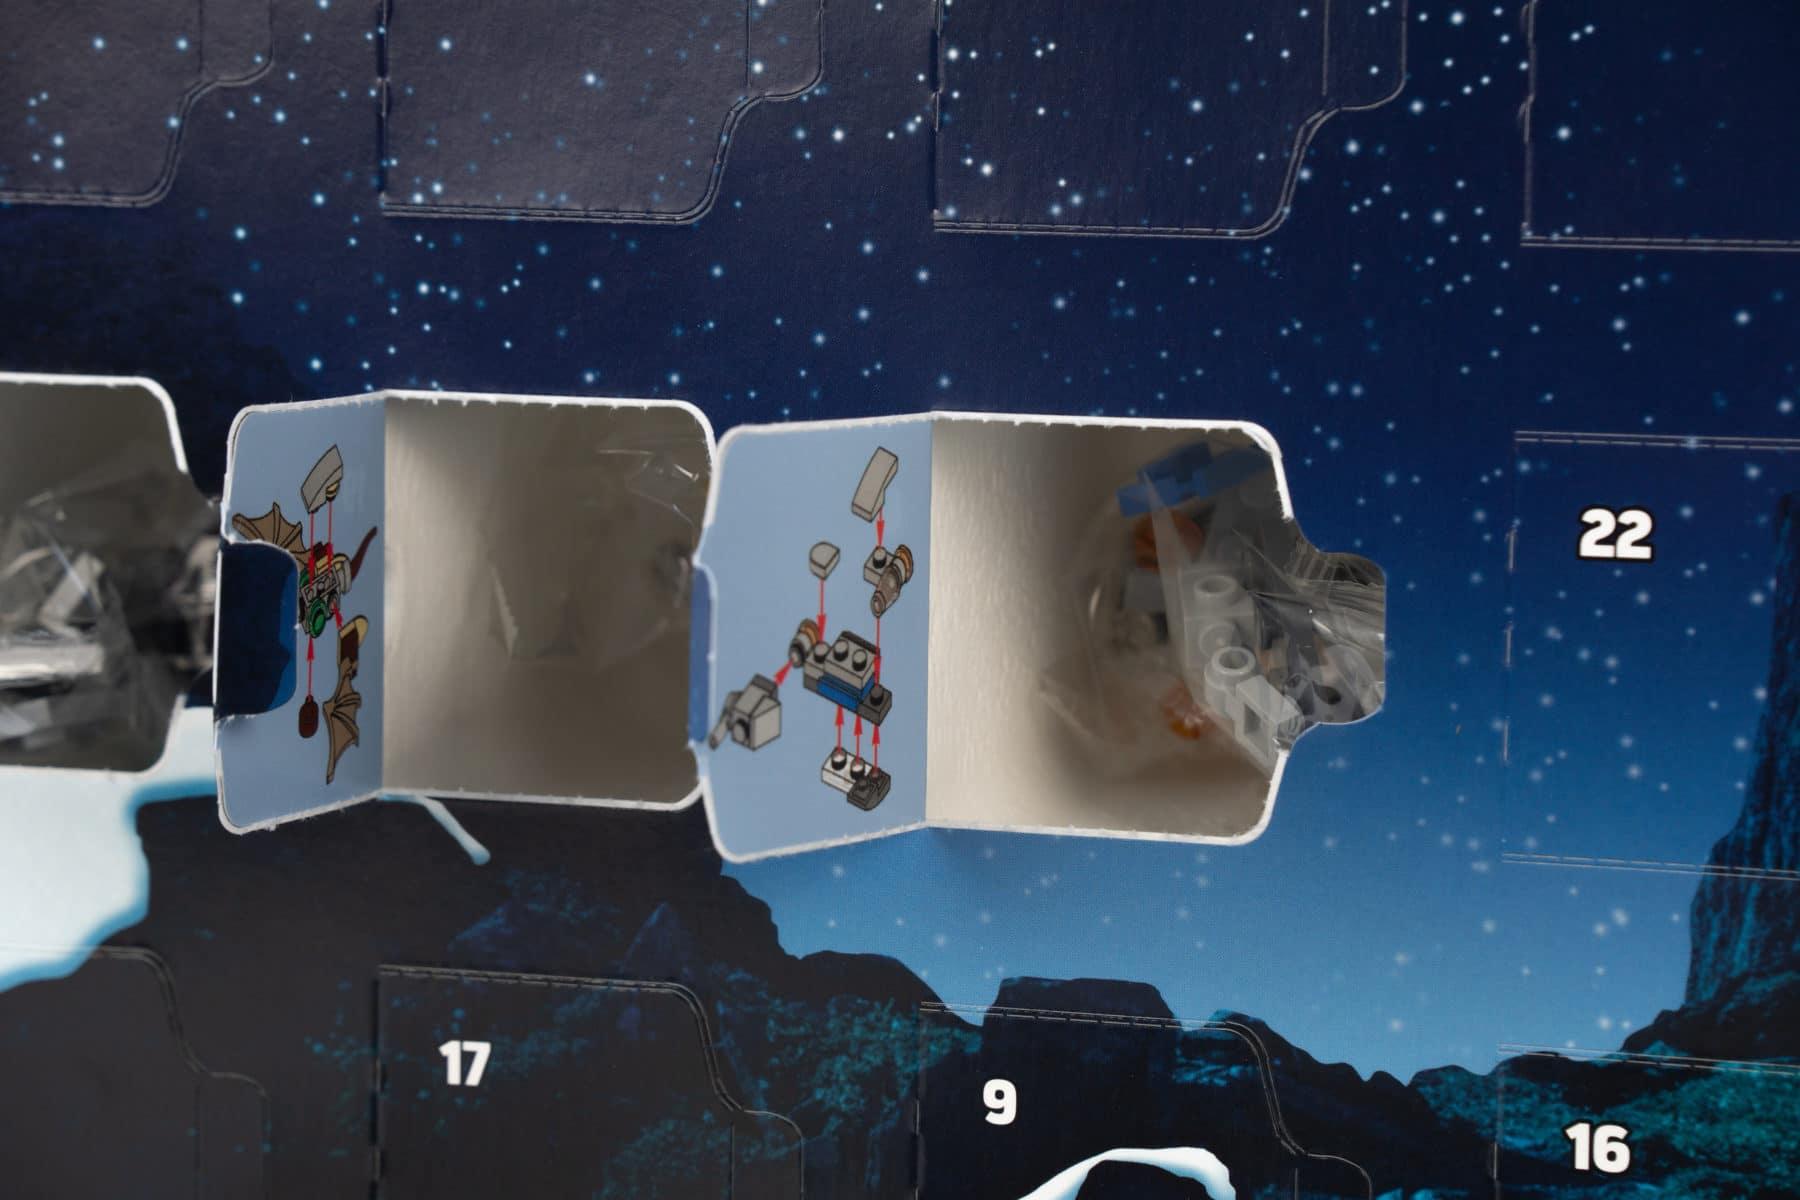 LEGO Star Wars 75245 Adventskalender geöffnet